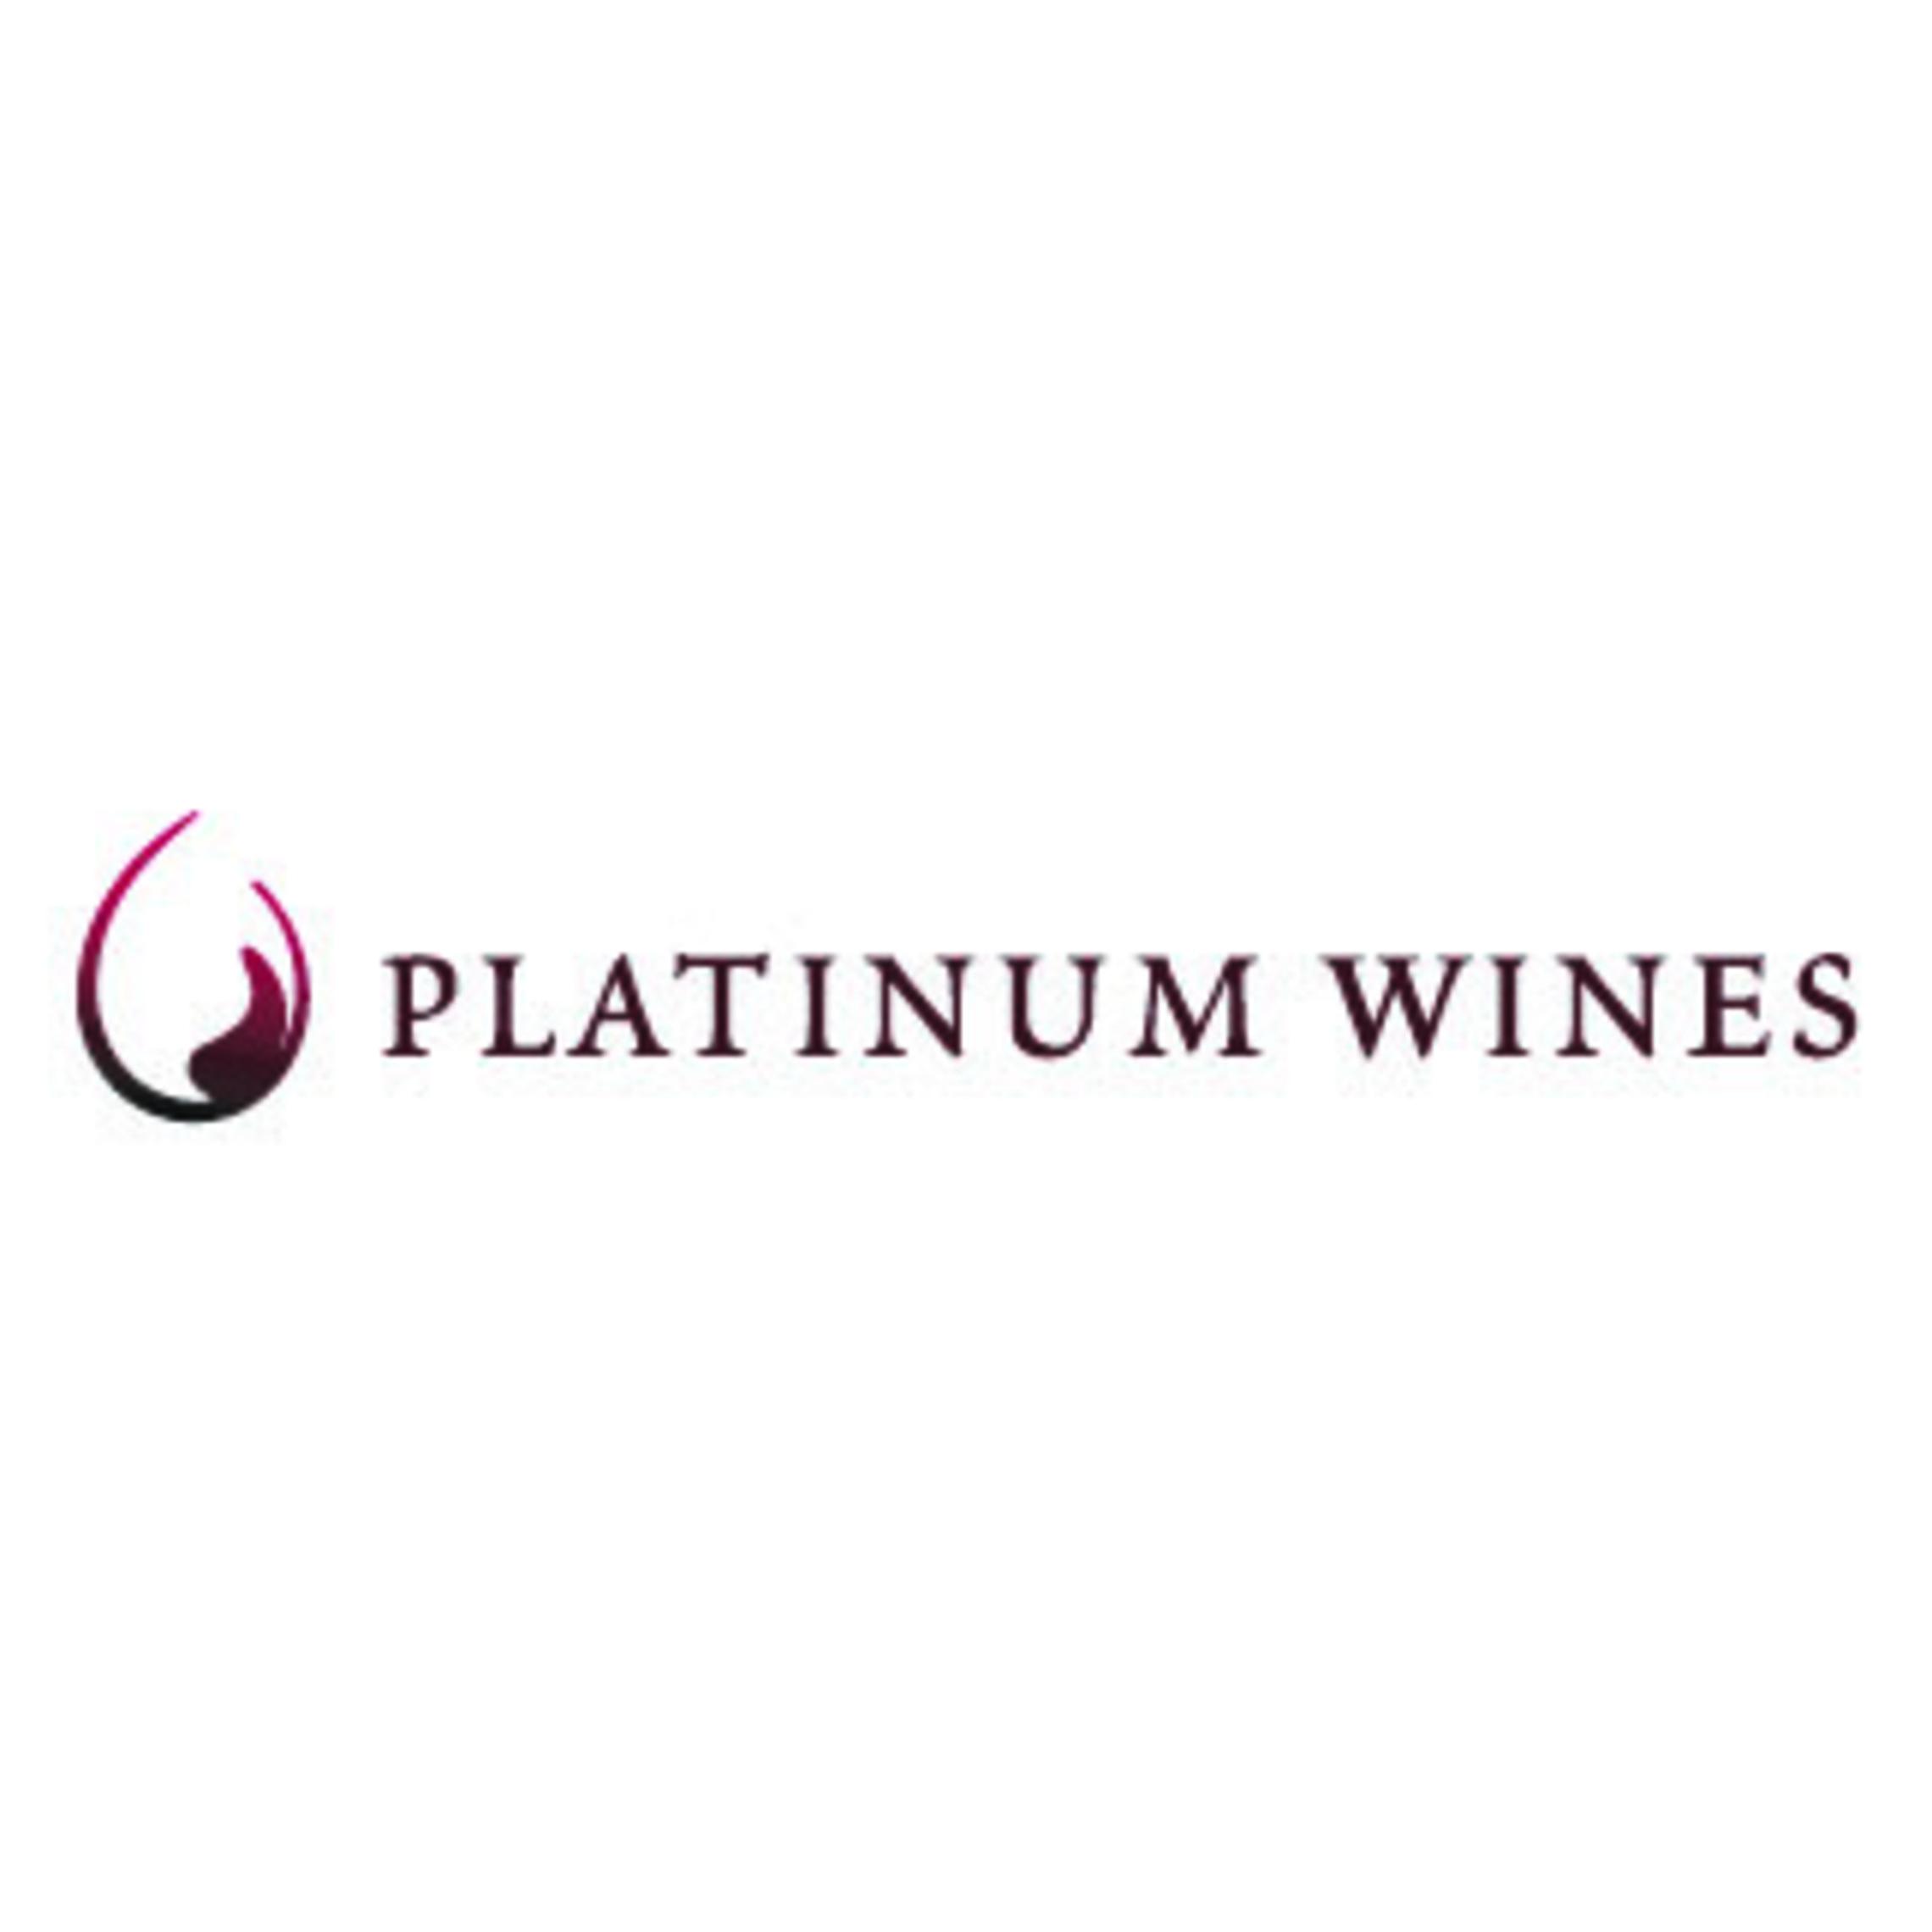 platinum wines- company logo